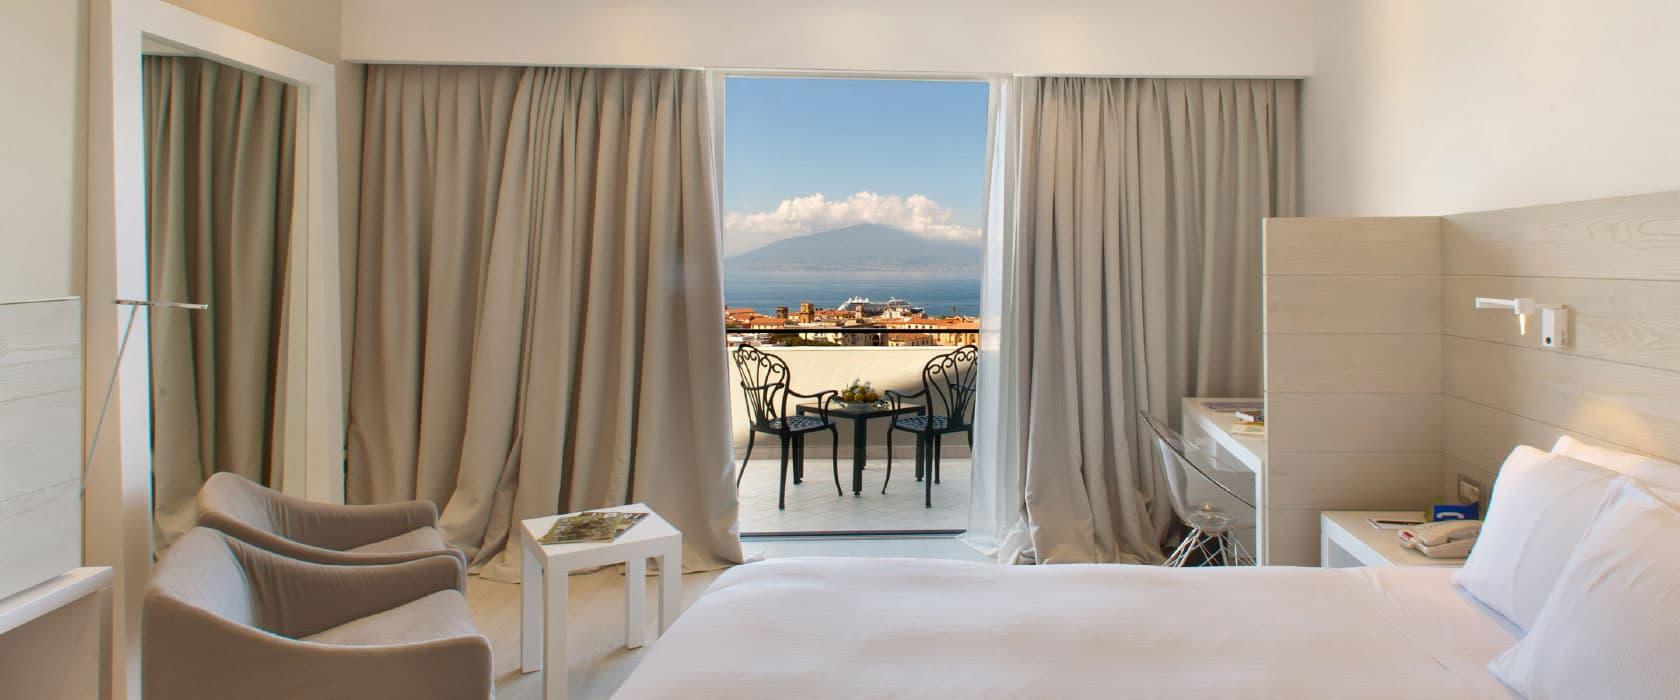 Executive room with sea views